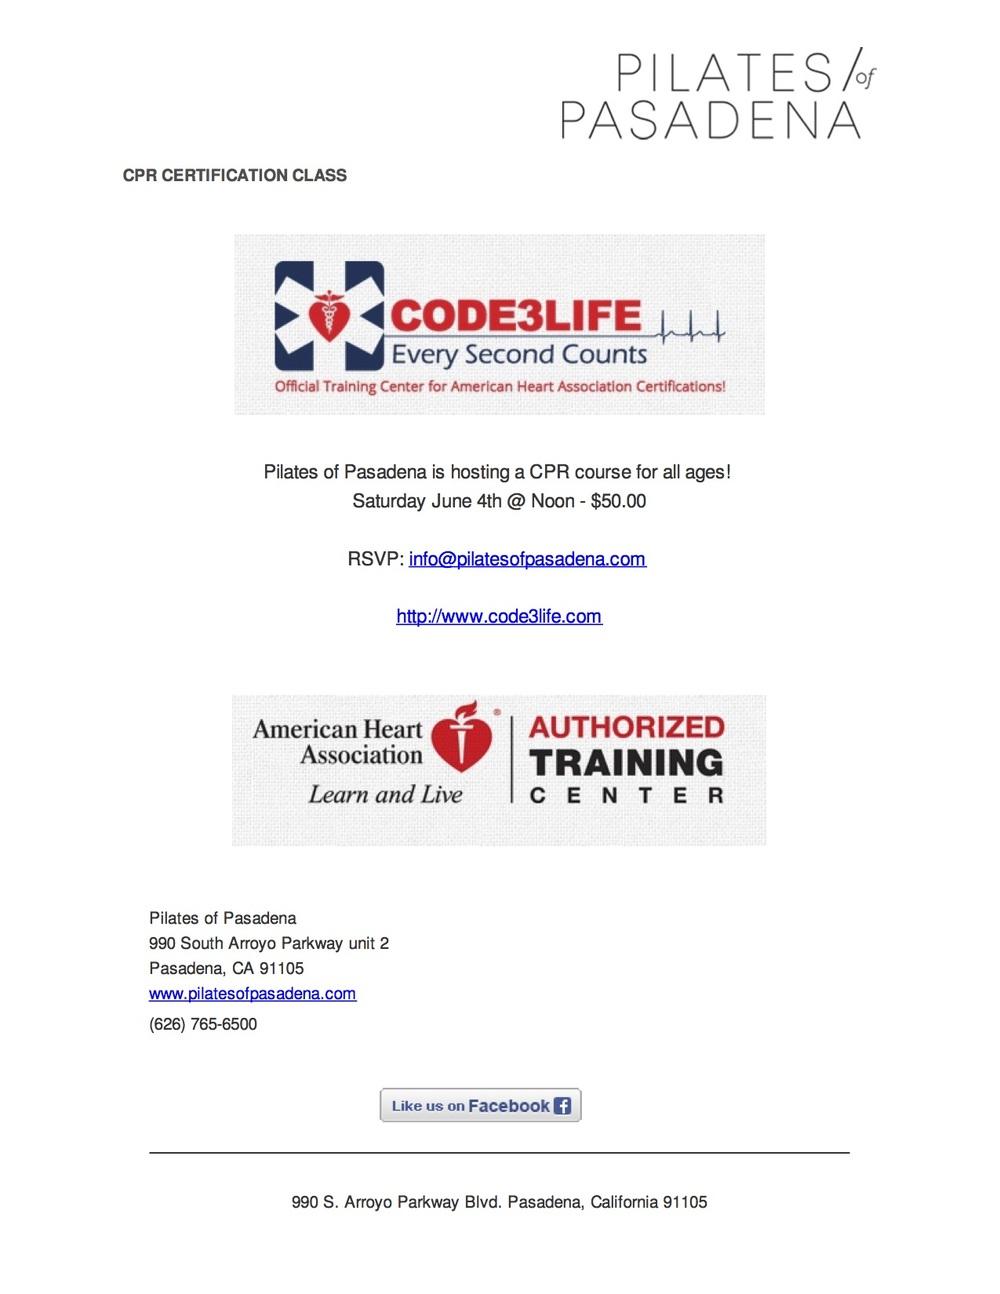 Cpr Training Coming Pilates Of Pasadena